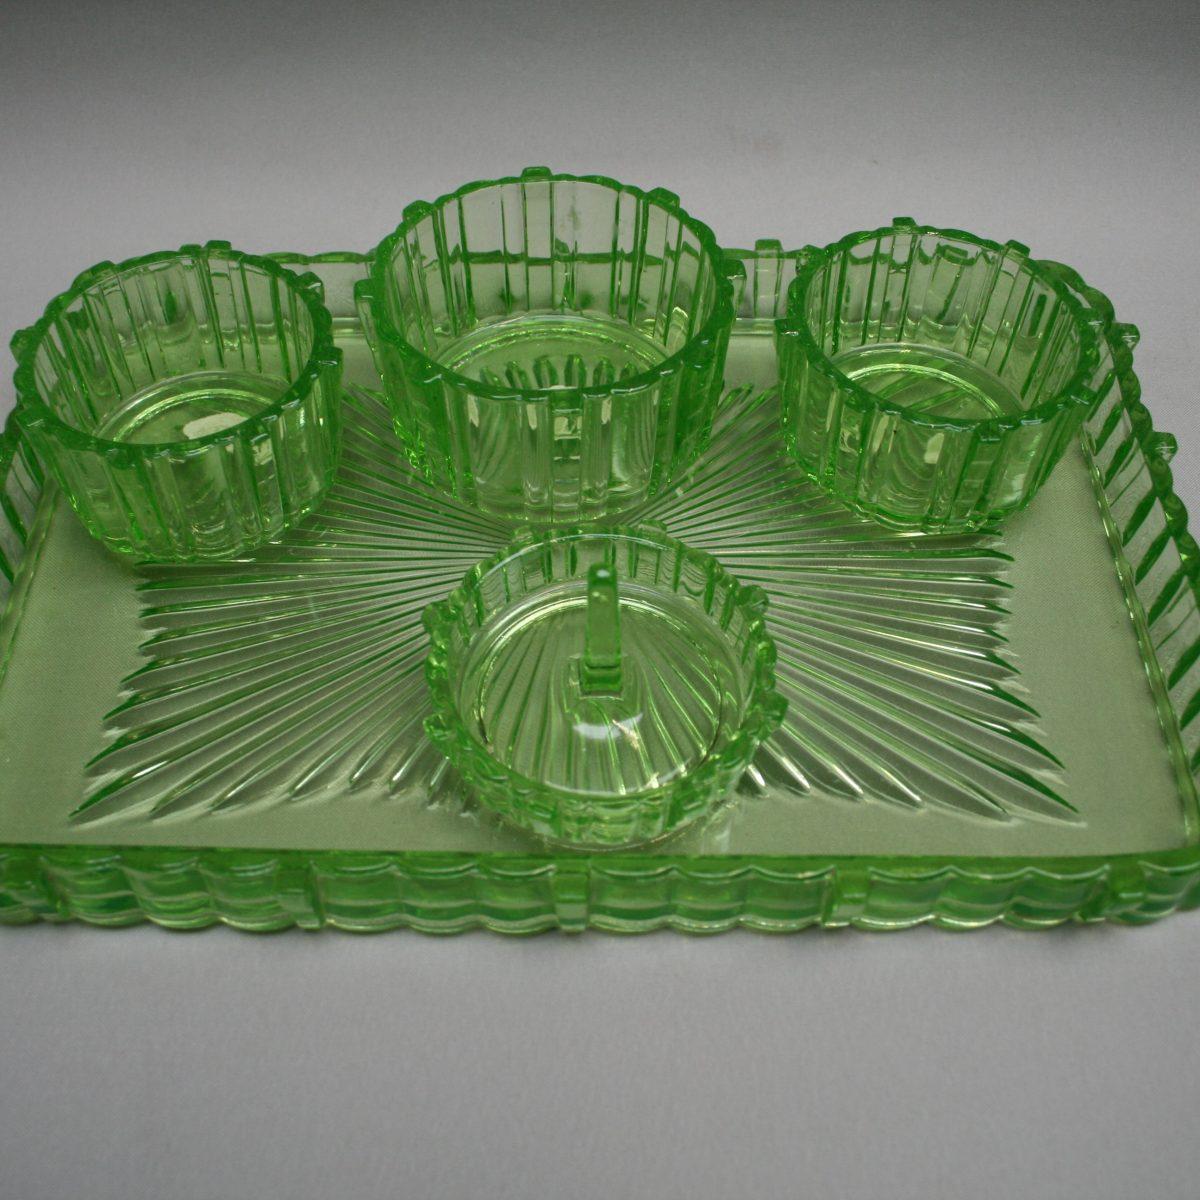 green glass dressing table set/williamsantiques